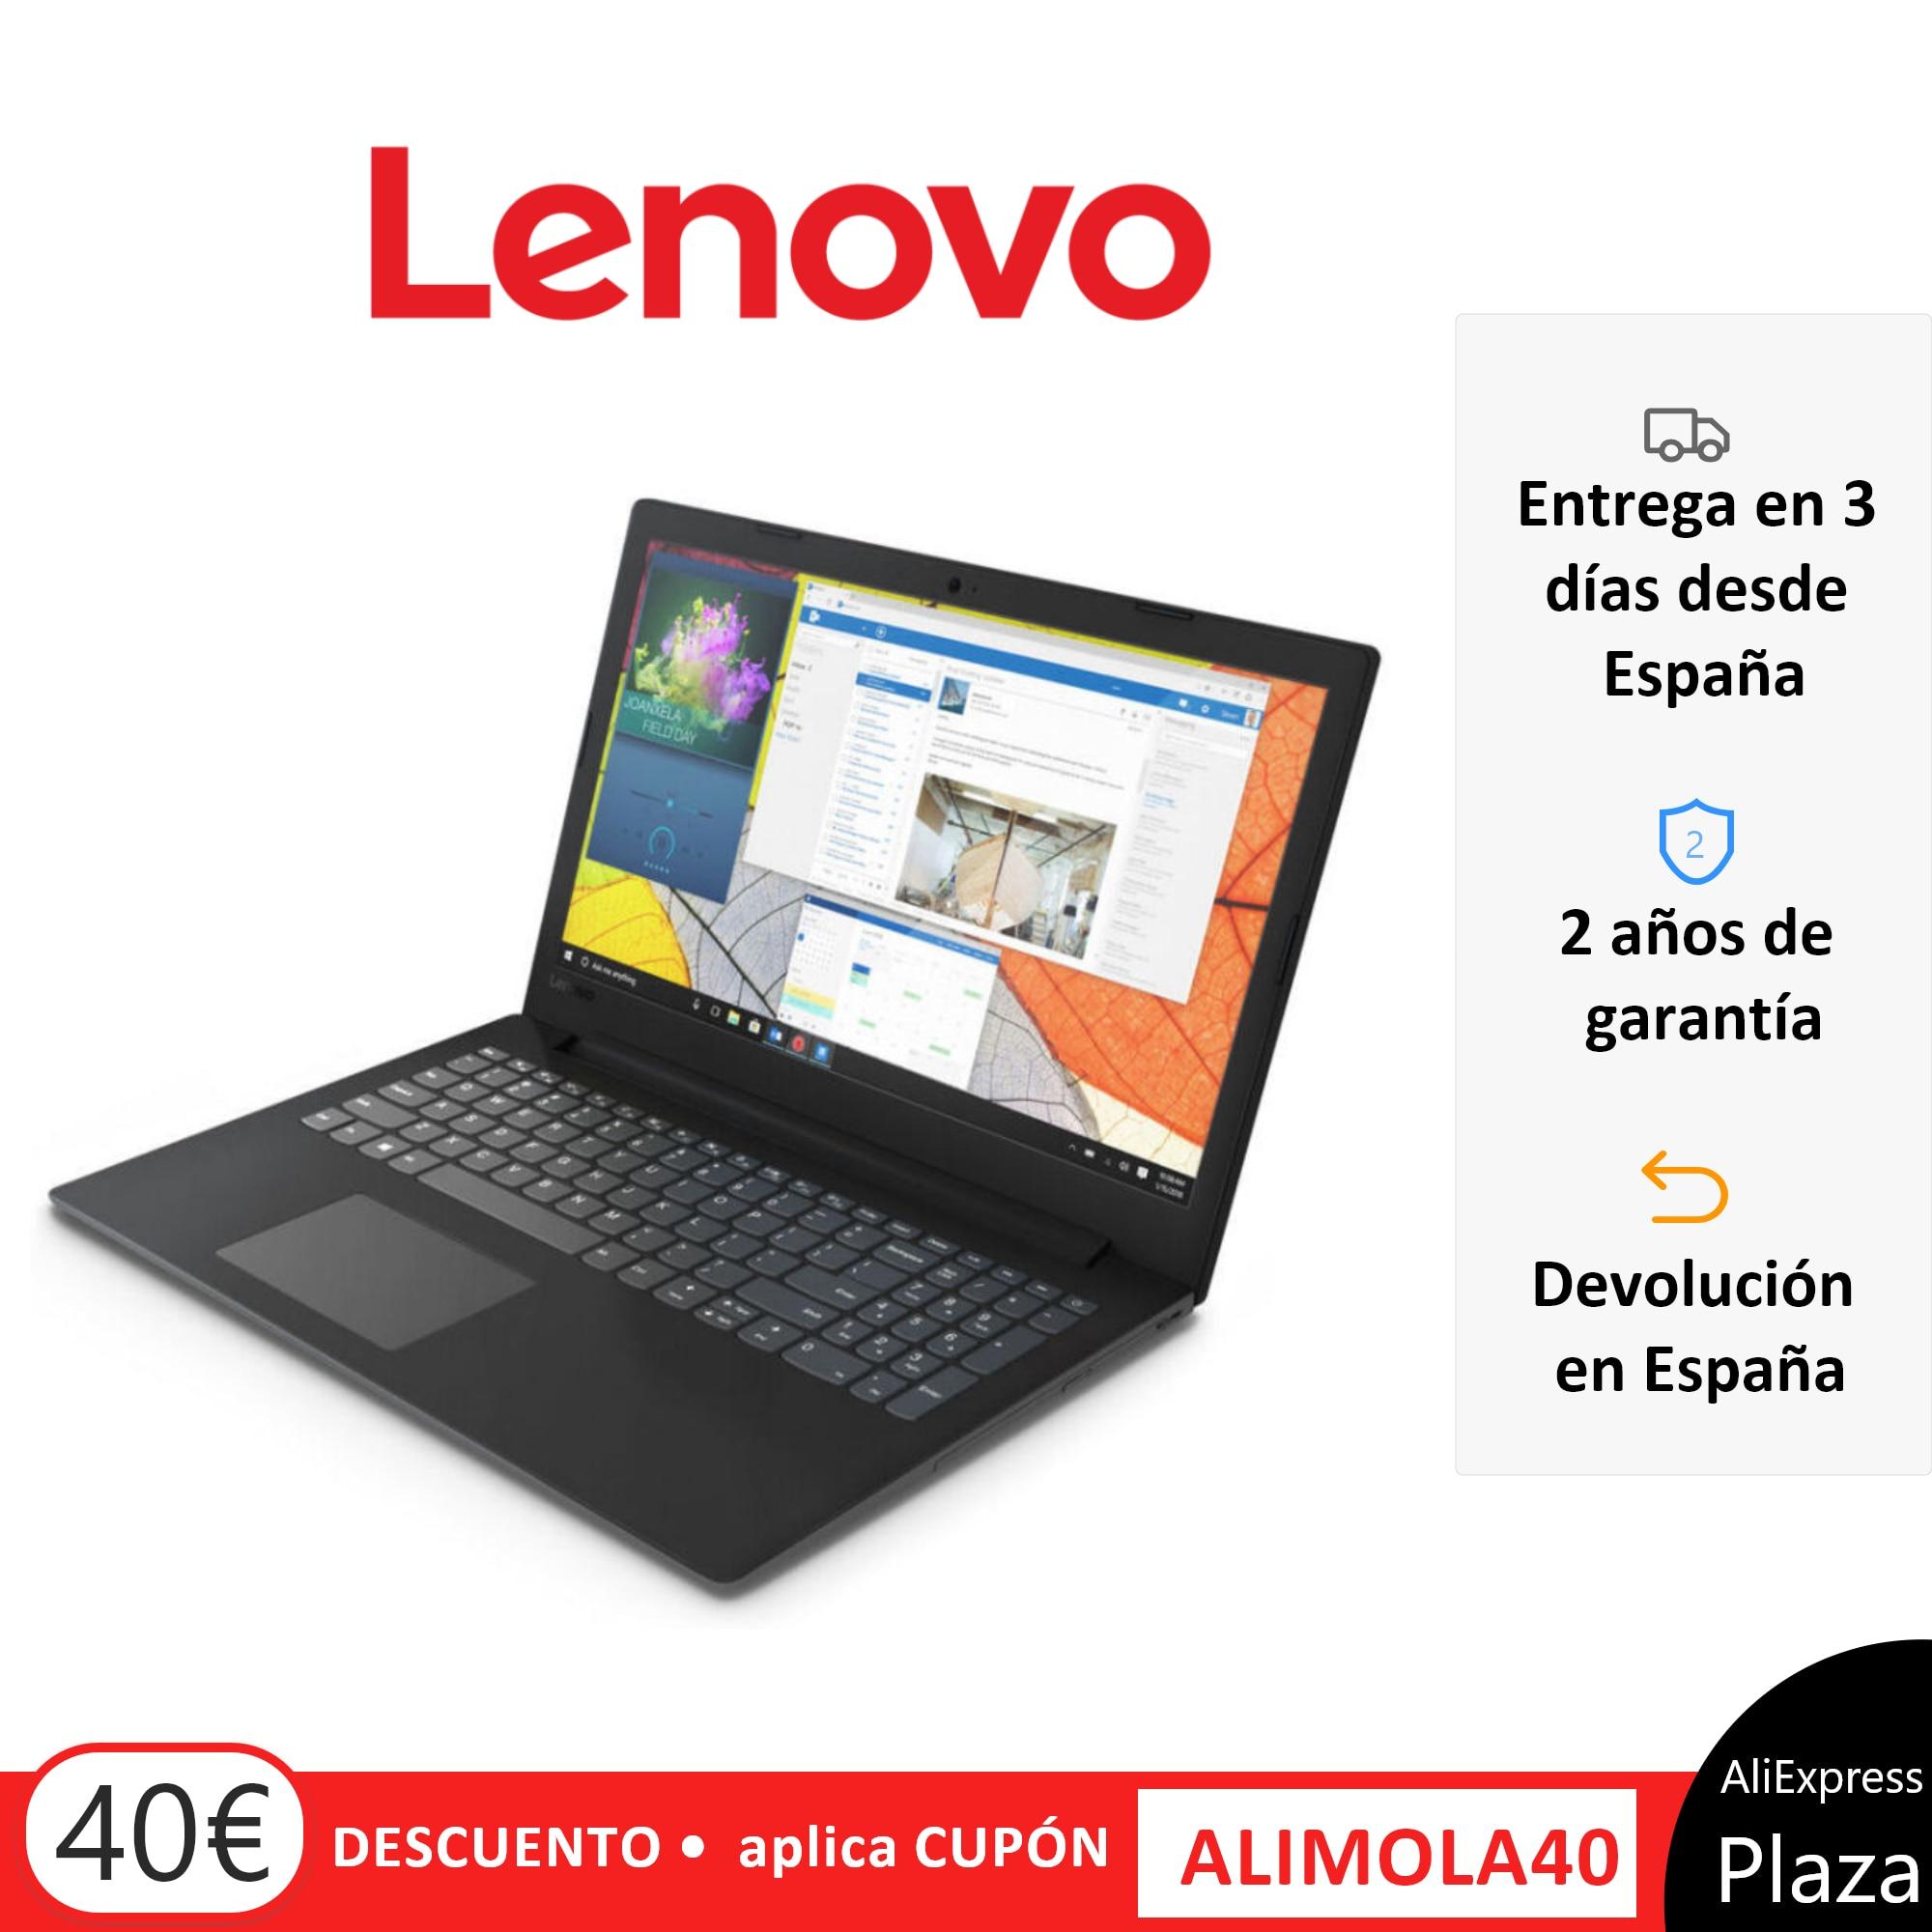 COMPUTER TRAGBARE 15 ''-LENOVO V145-15AST-AMD A9-9425/8 GBGB/256 SSD/RADEON R5-windows 10 Hause FHD teclado-Spainish